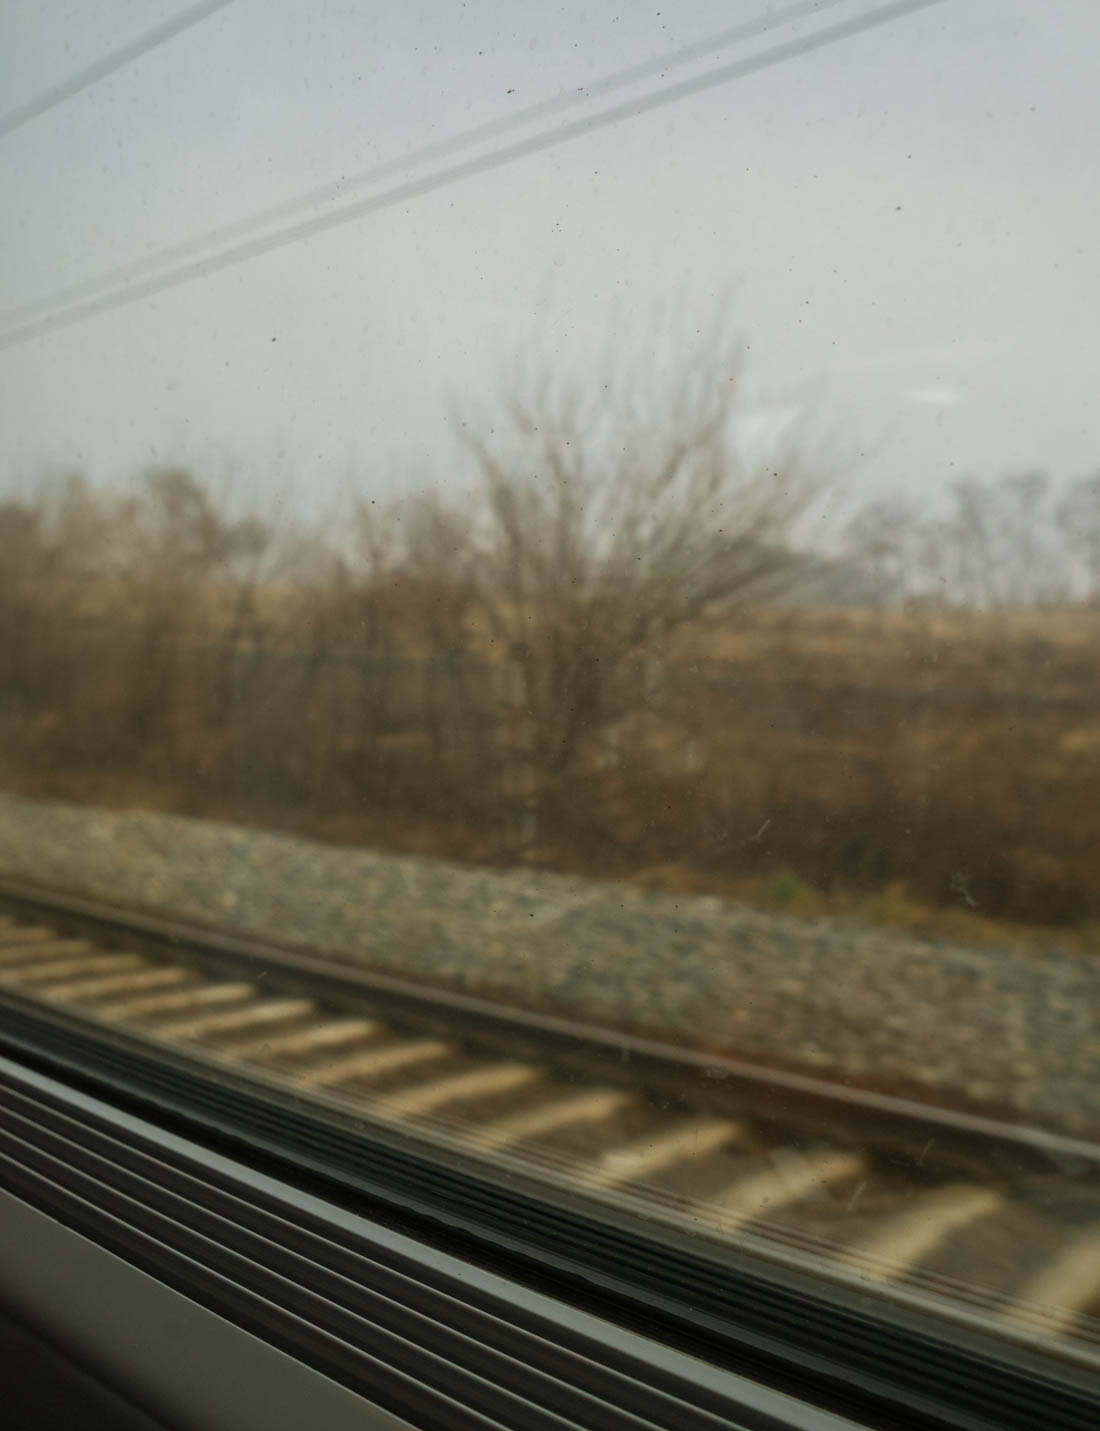 KTX Busan train window view